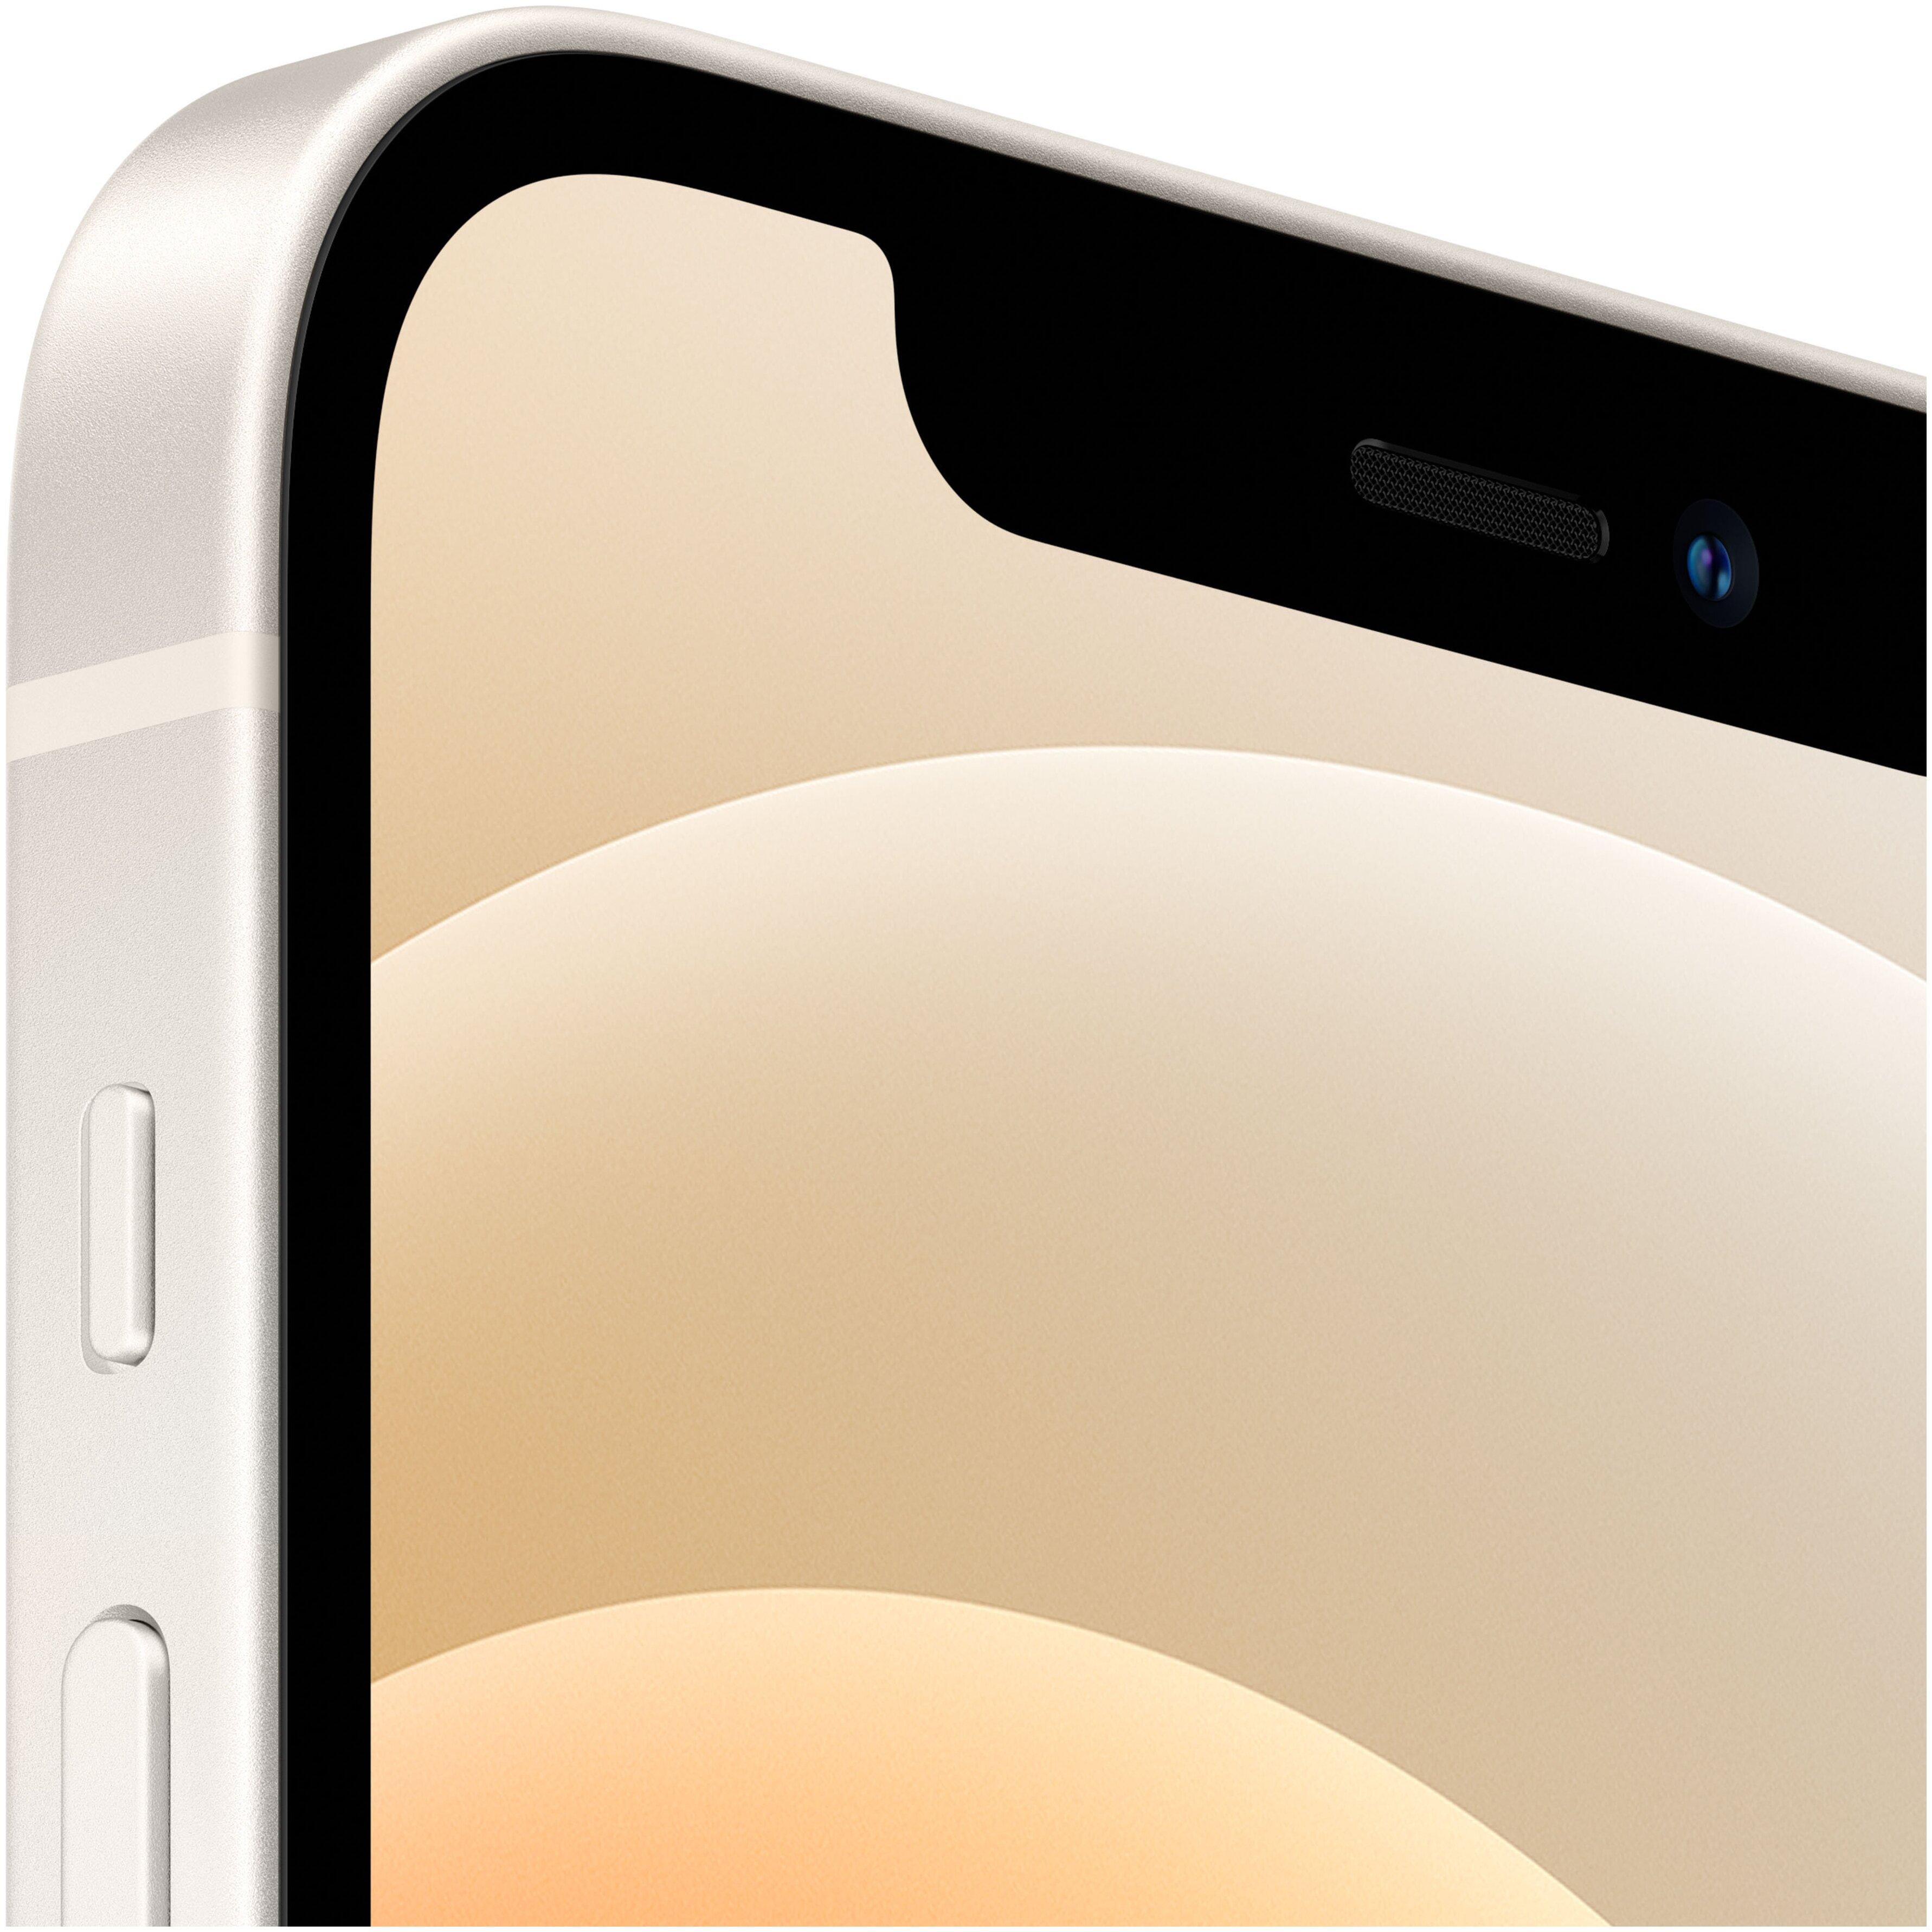 Apple iPhone 12 128GB - операционная система: iOS 14